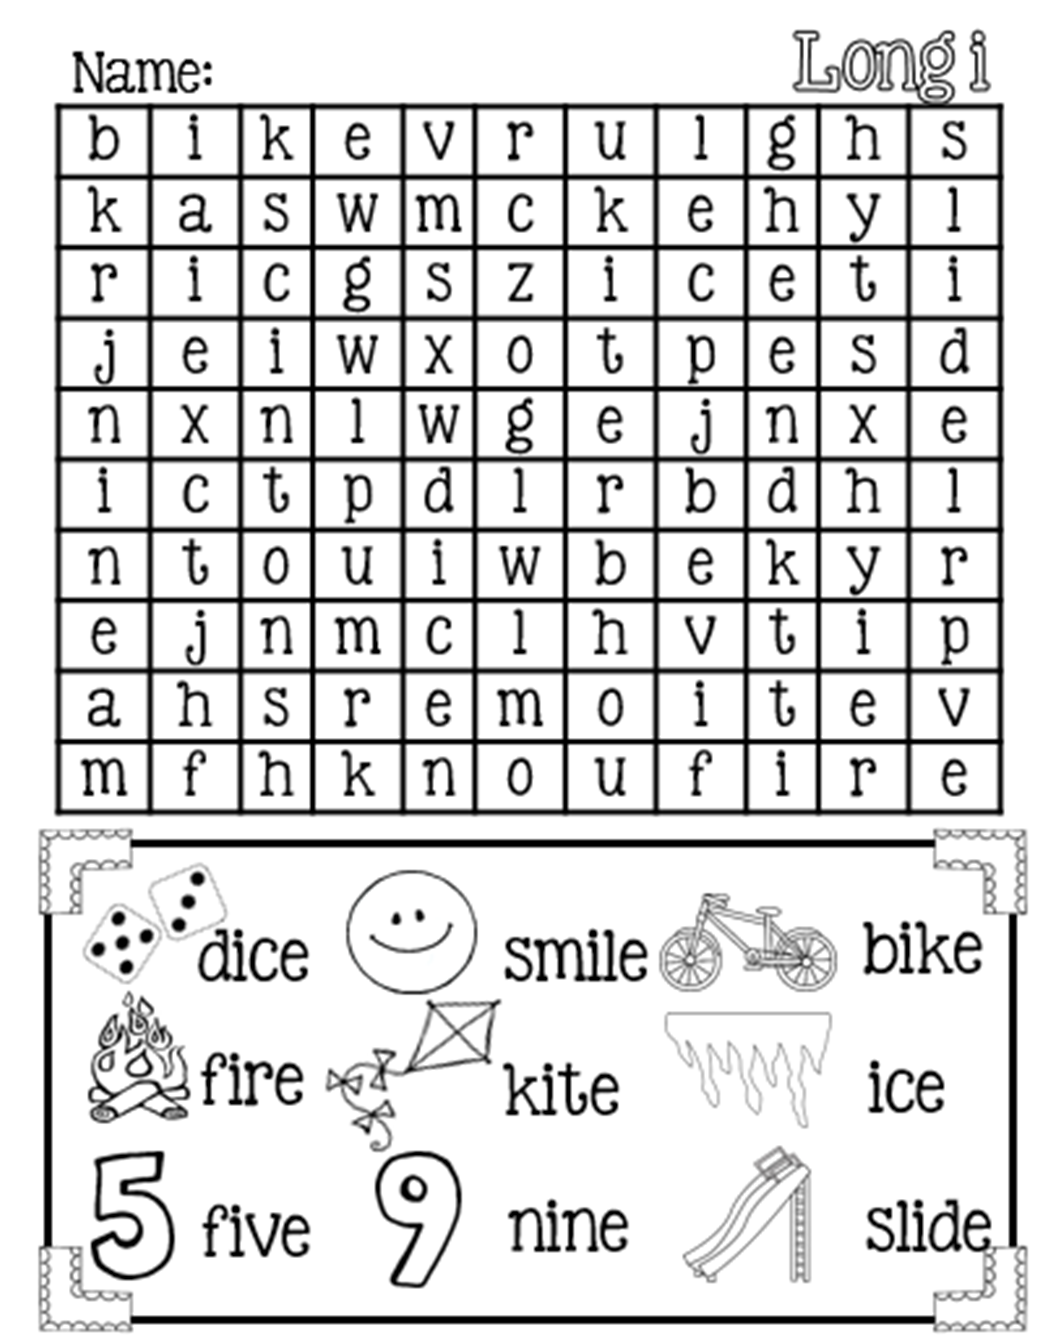 small resolution of Magic E Long I Word Search {FREE}   Magic e